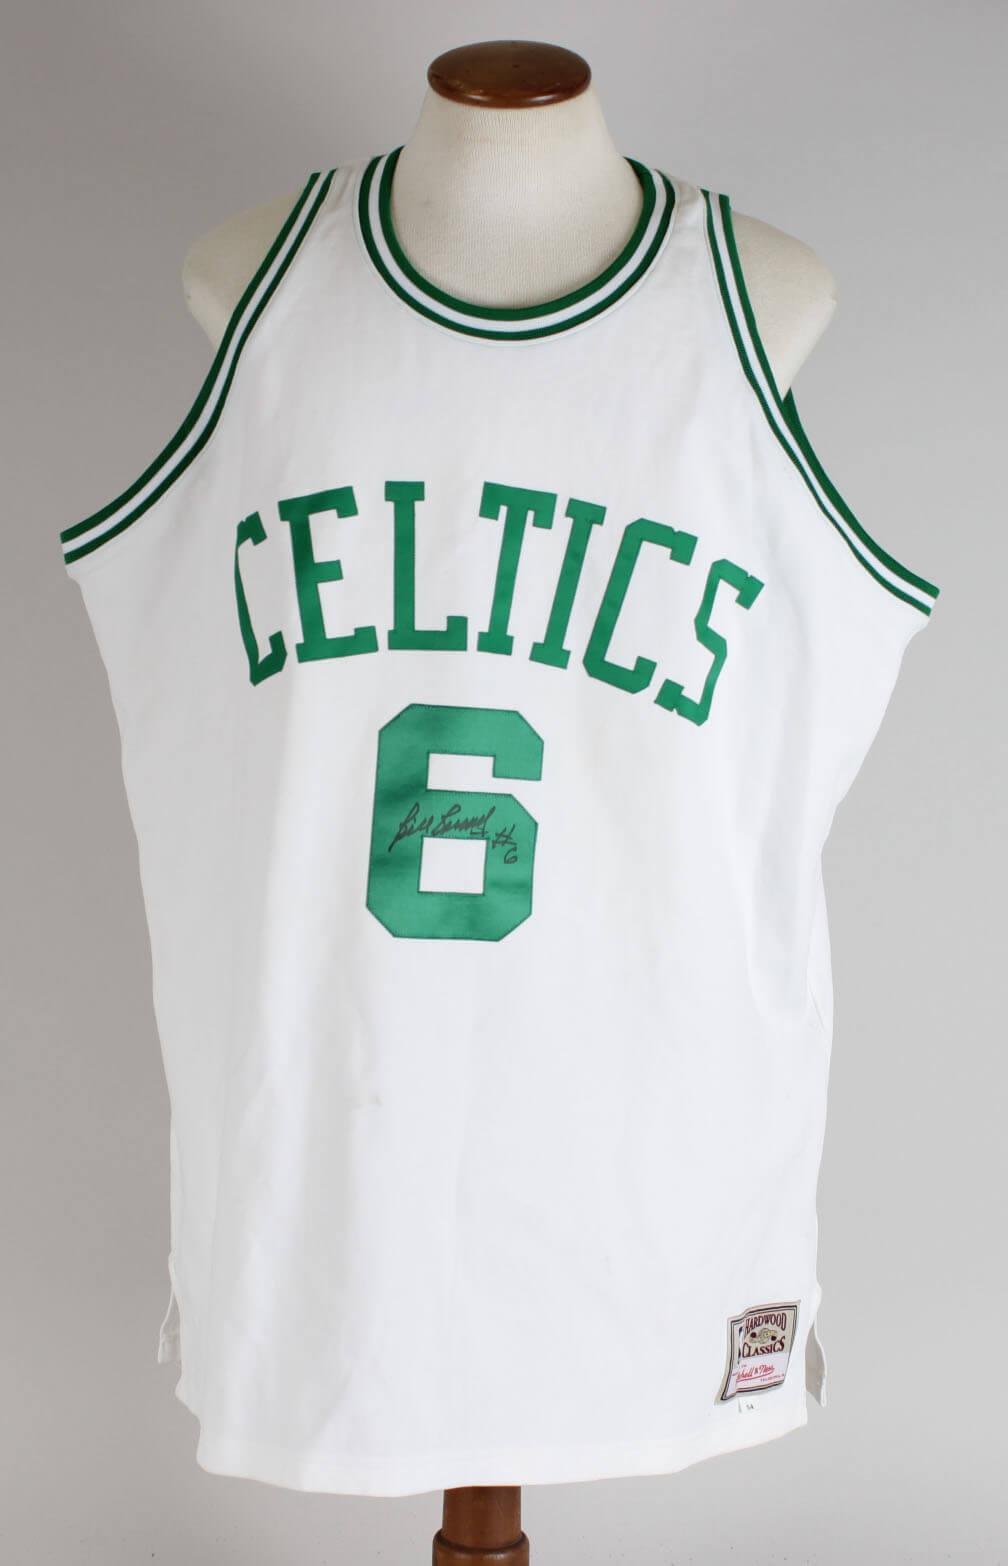 new styles a103c a5de2 Bill Russell Signed Jersey Celtics - COA JSA